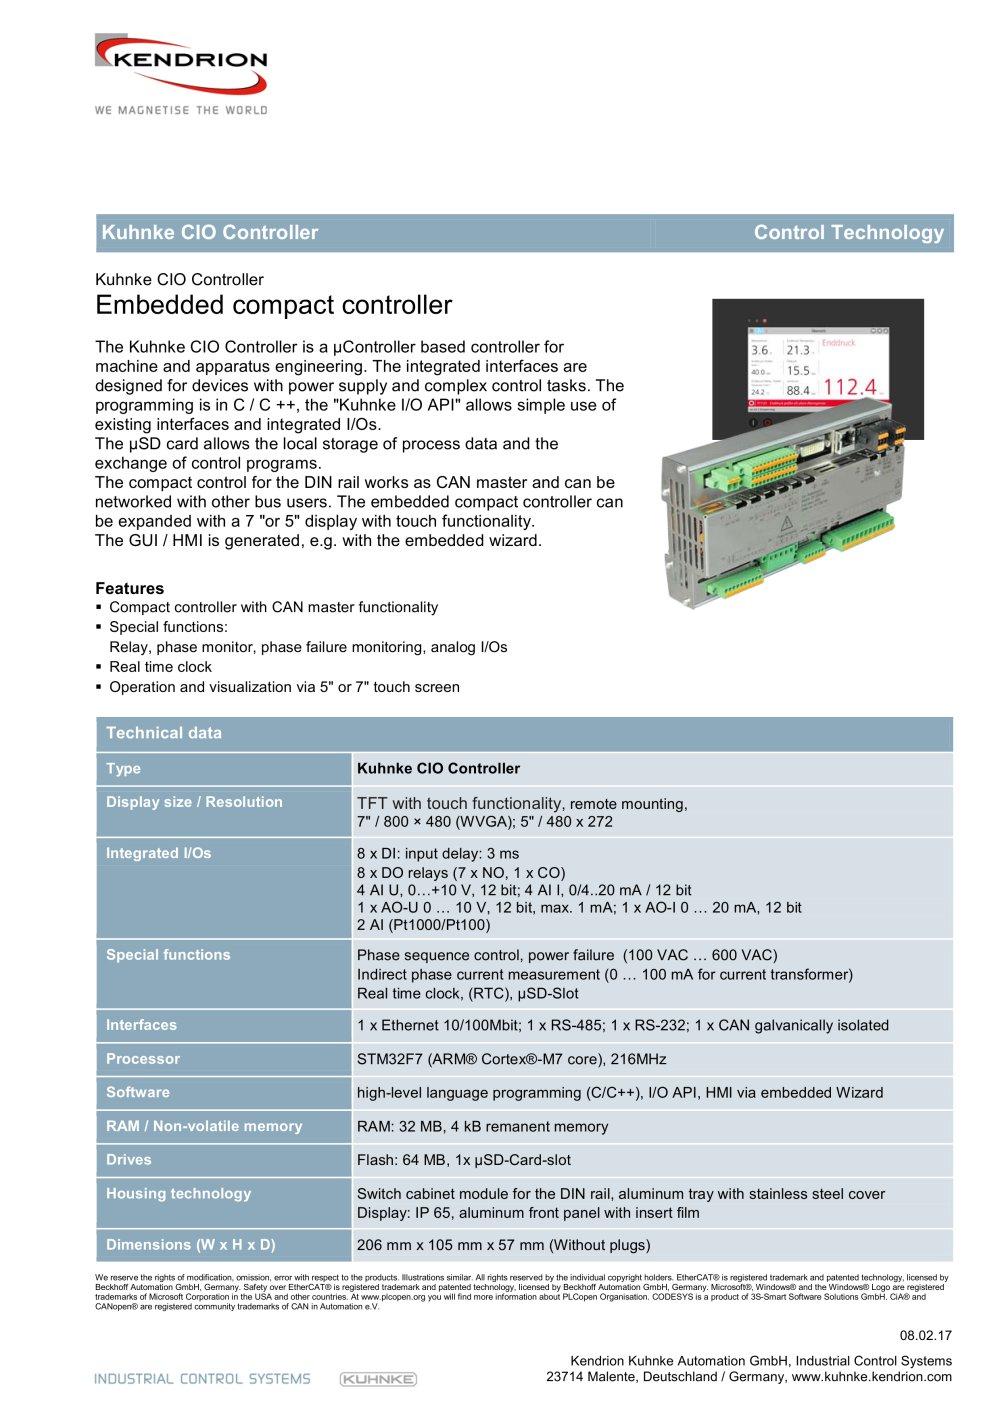 Kuhnke CIO Controller - Kendrion Kuhnke Automation GmbH - PDF